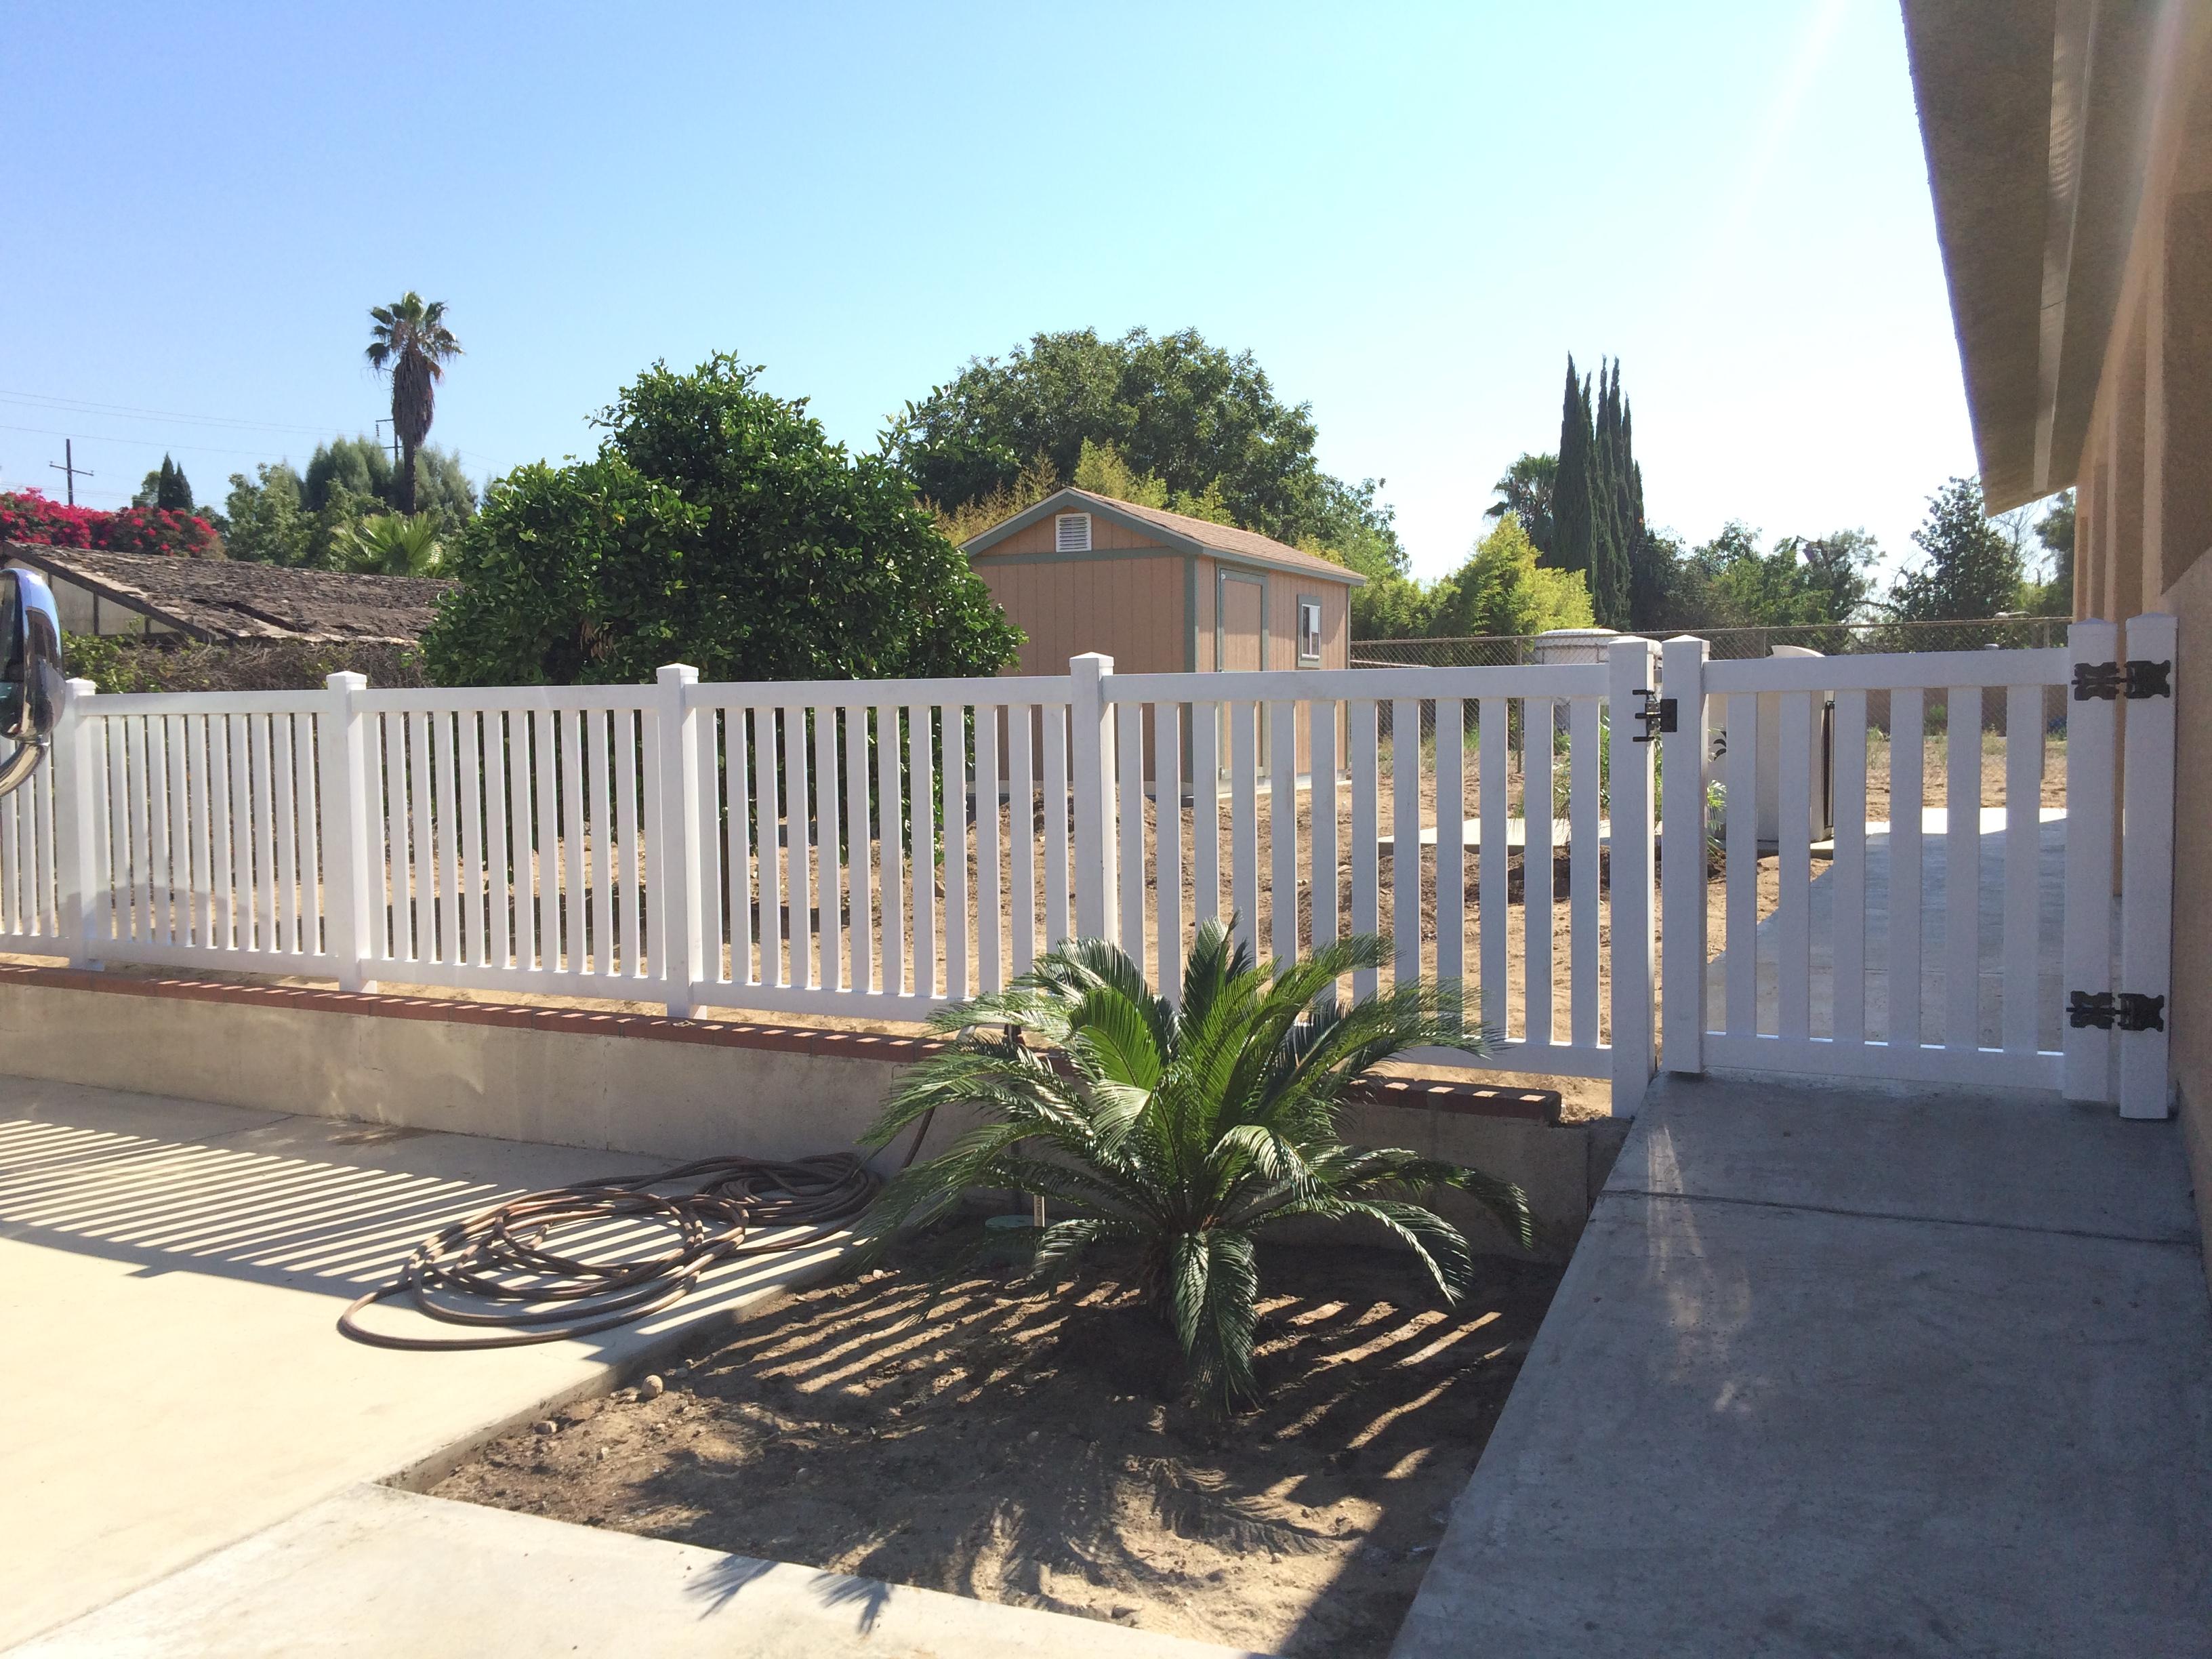 3T Fence image 6